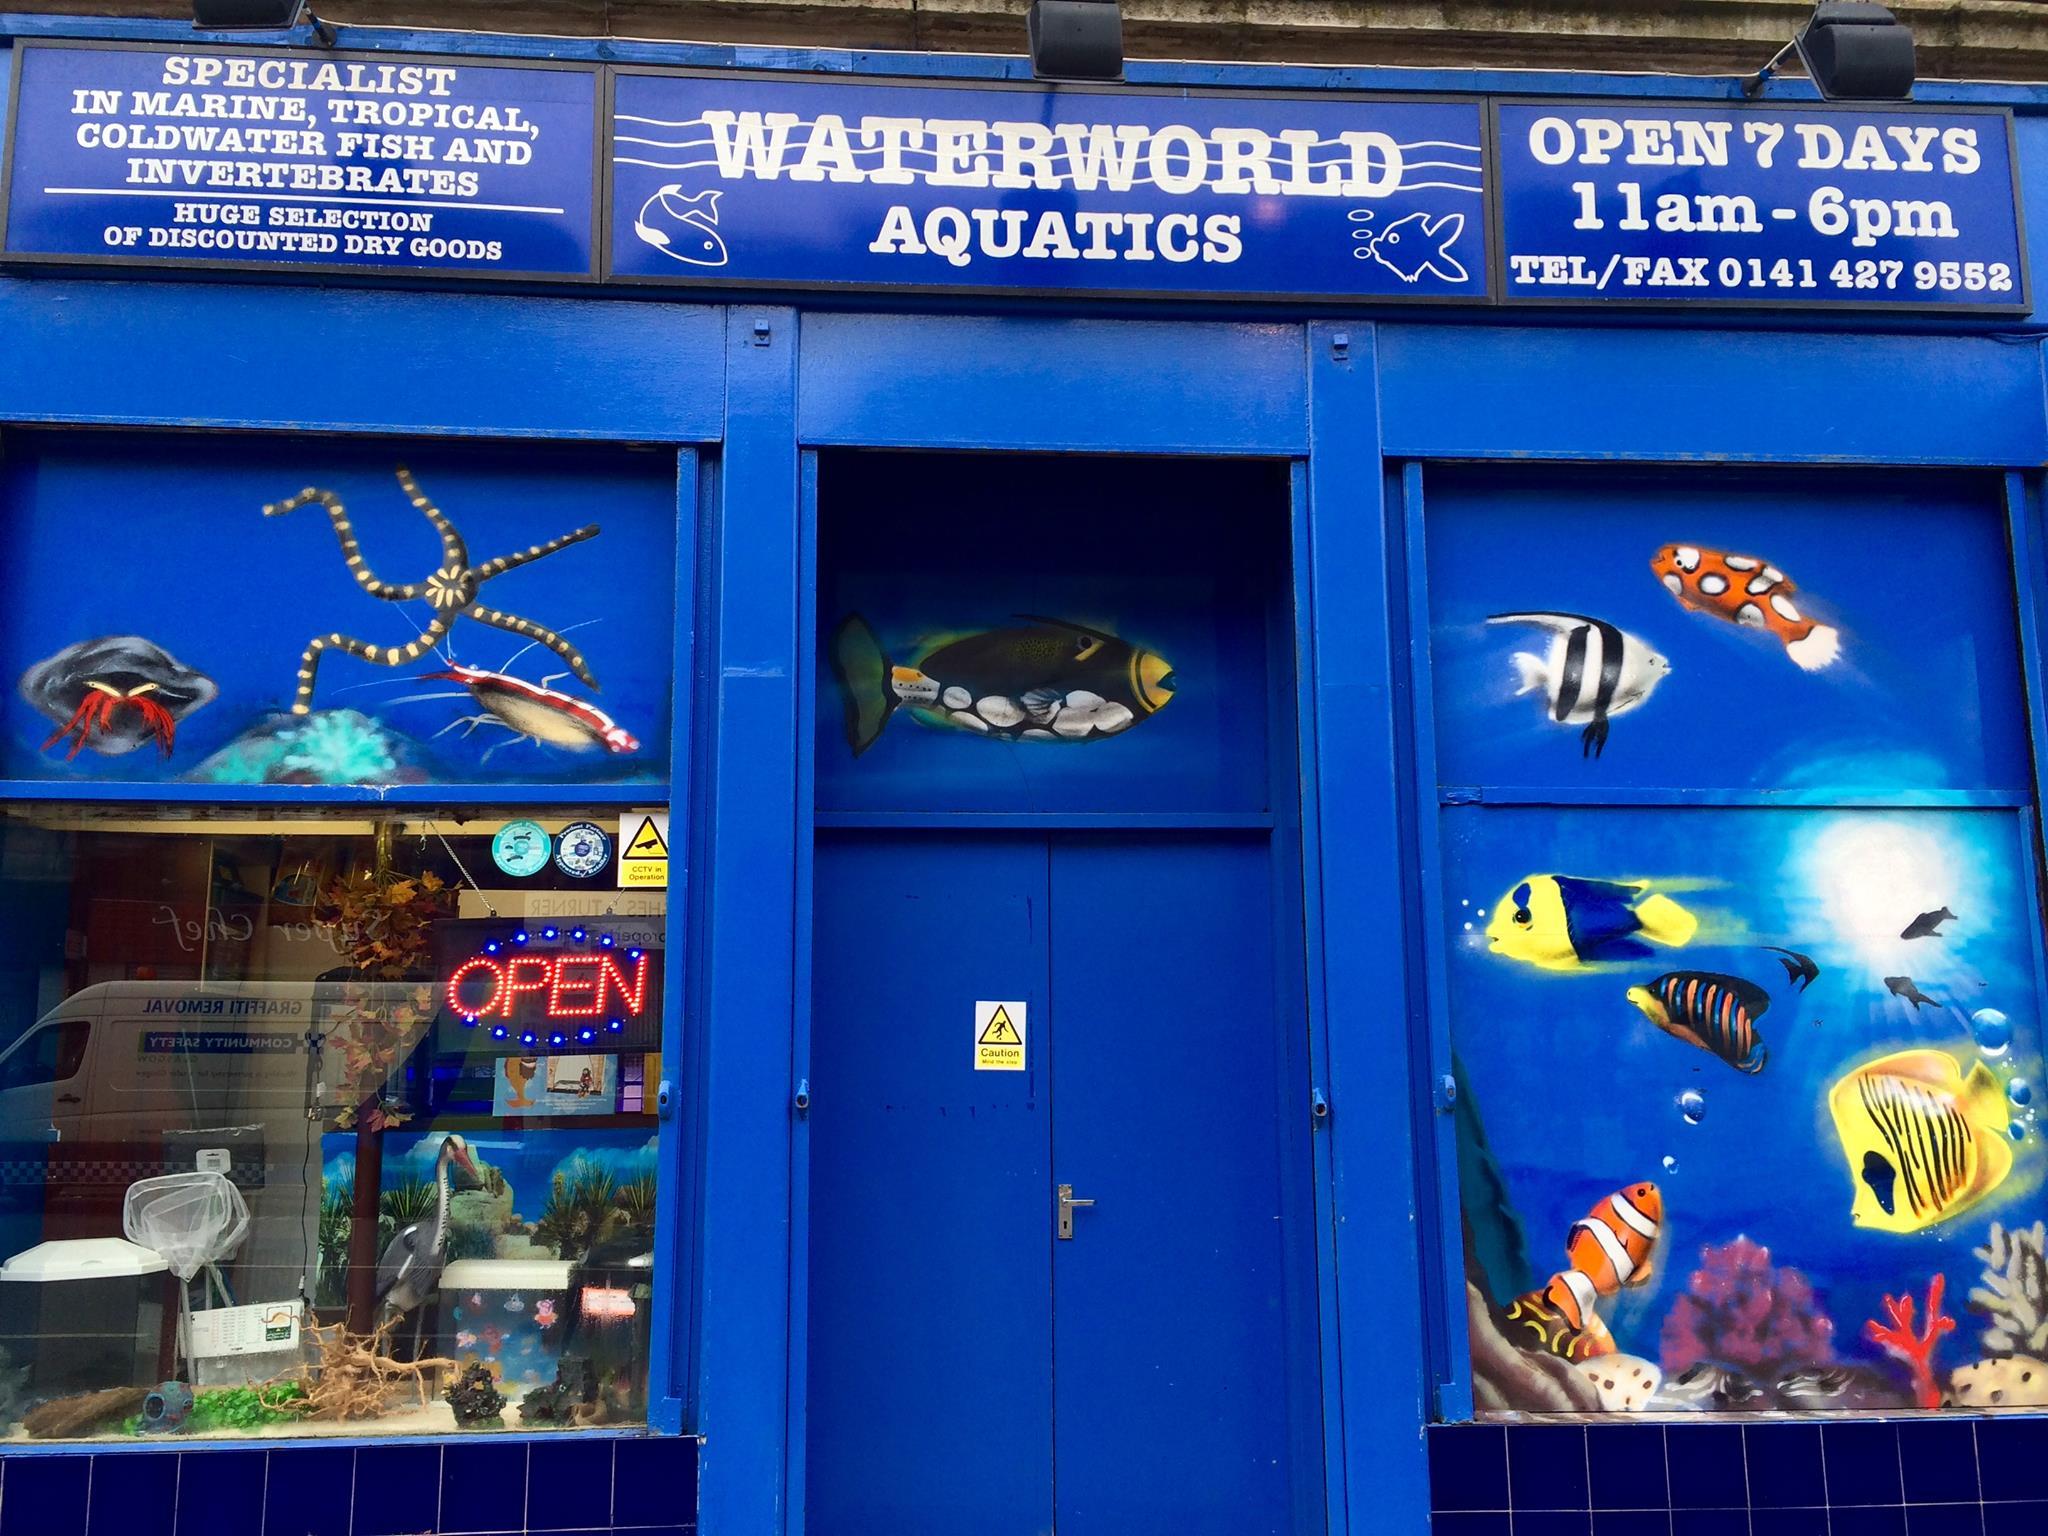 Waterworld Aquatics Glasgow Tropical & Marine Livestock